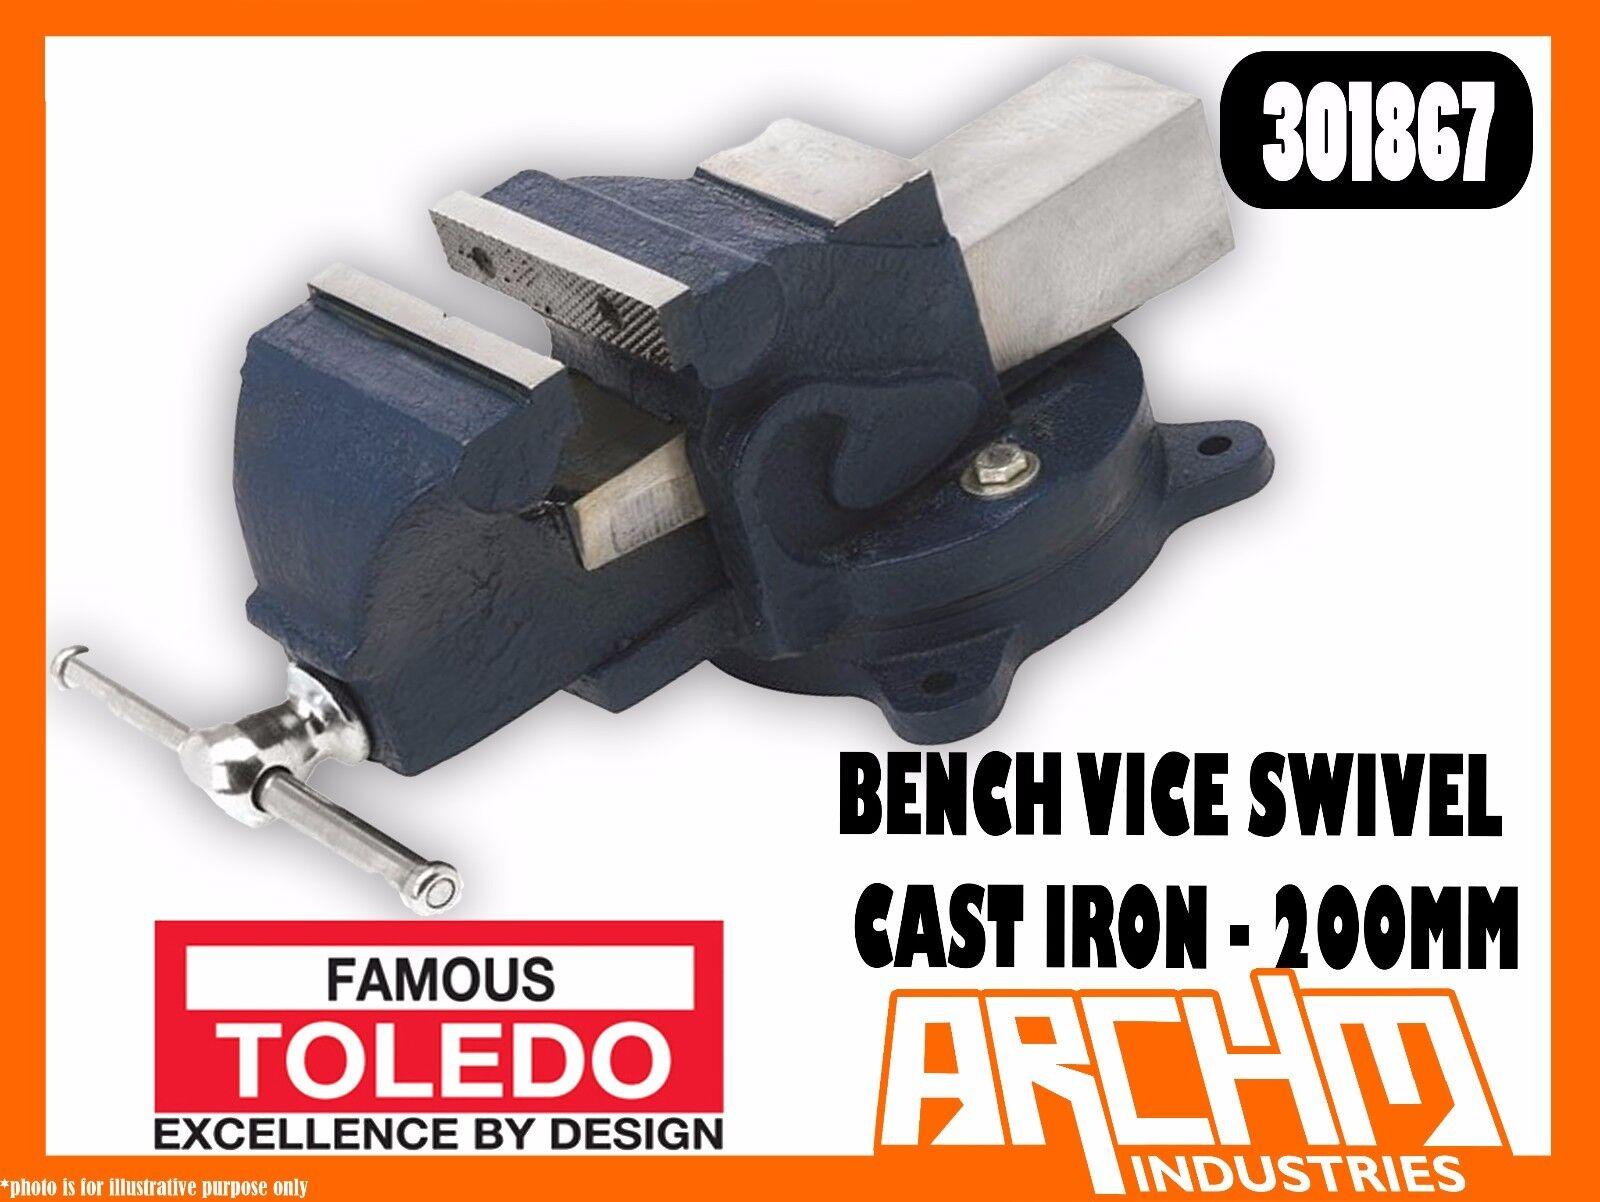 TOLEDO 301867 - BENCH VICE SWIVEL BASE STRAIGHT CAST IRON - 200MM